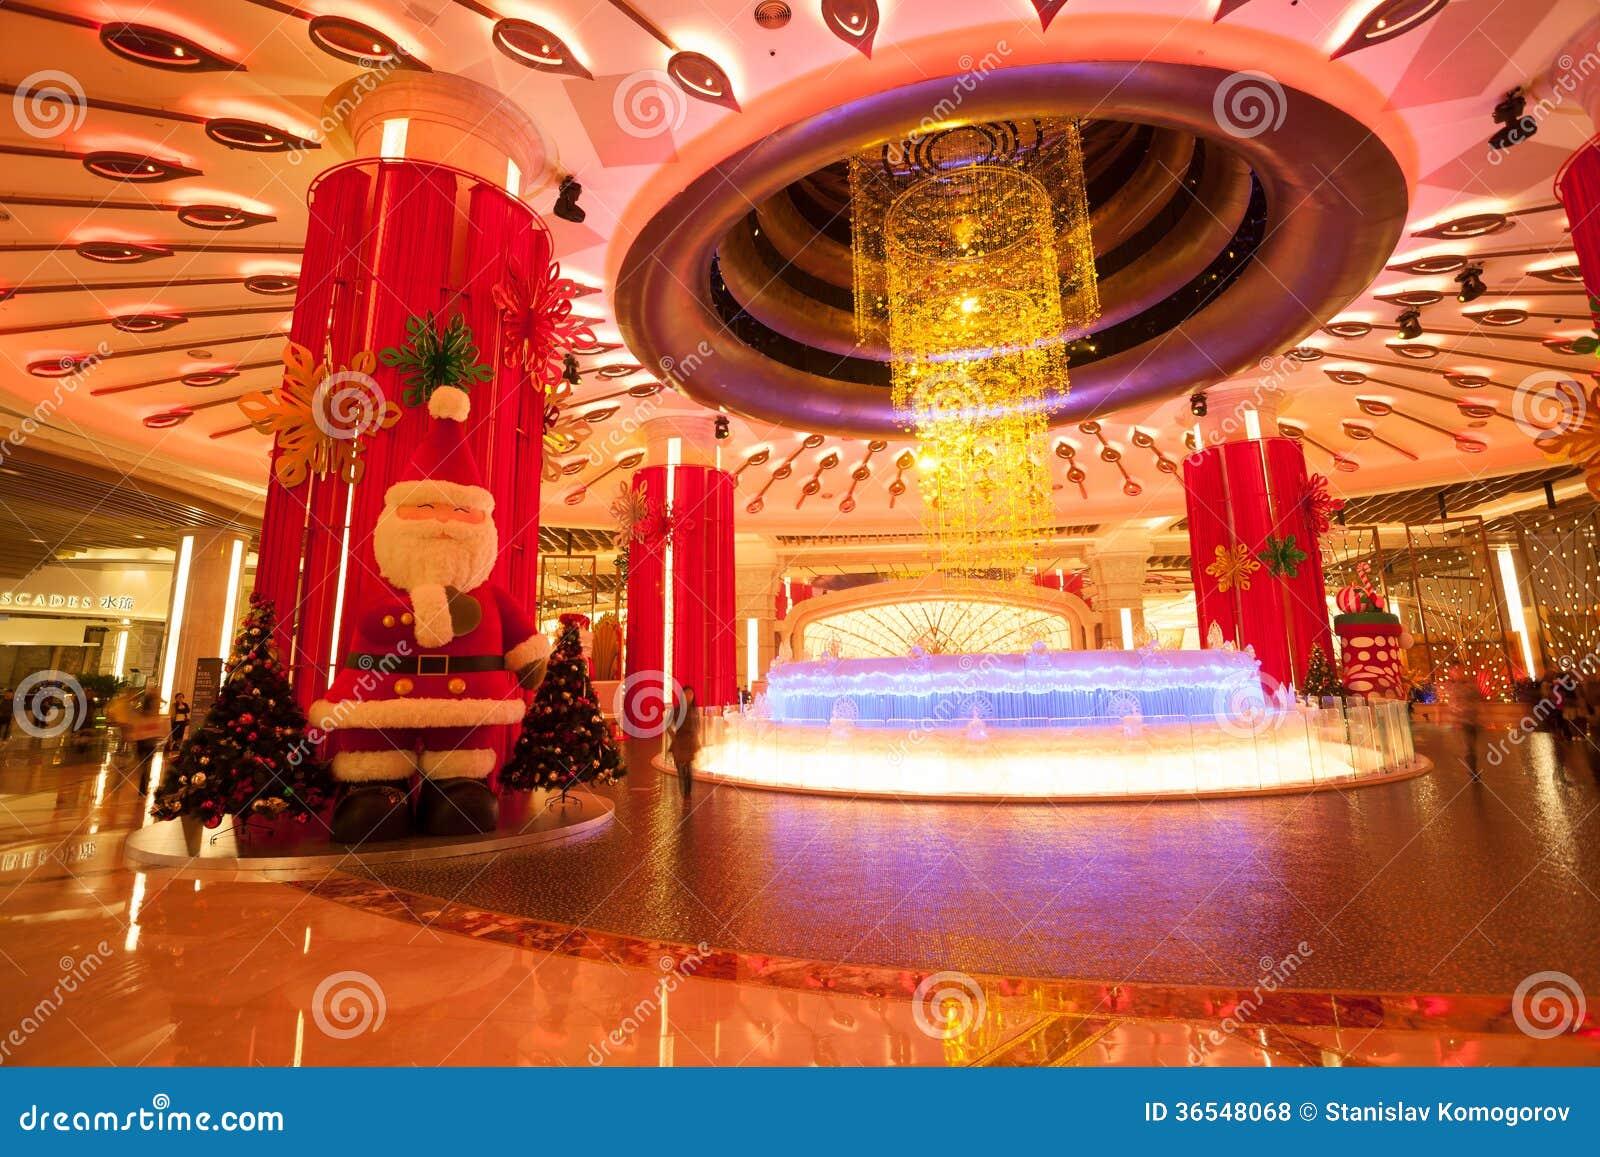 Galaxy casino macau share price